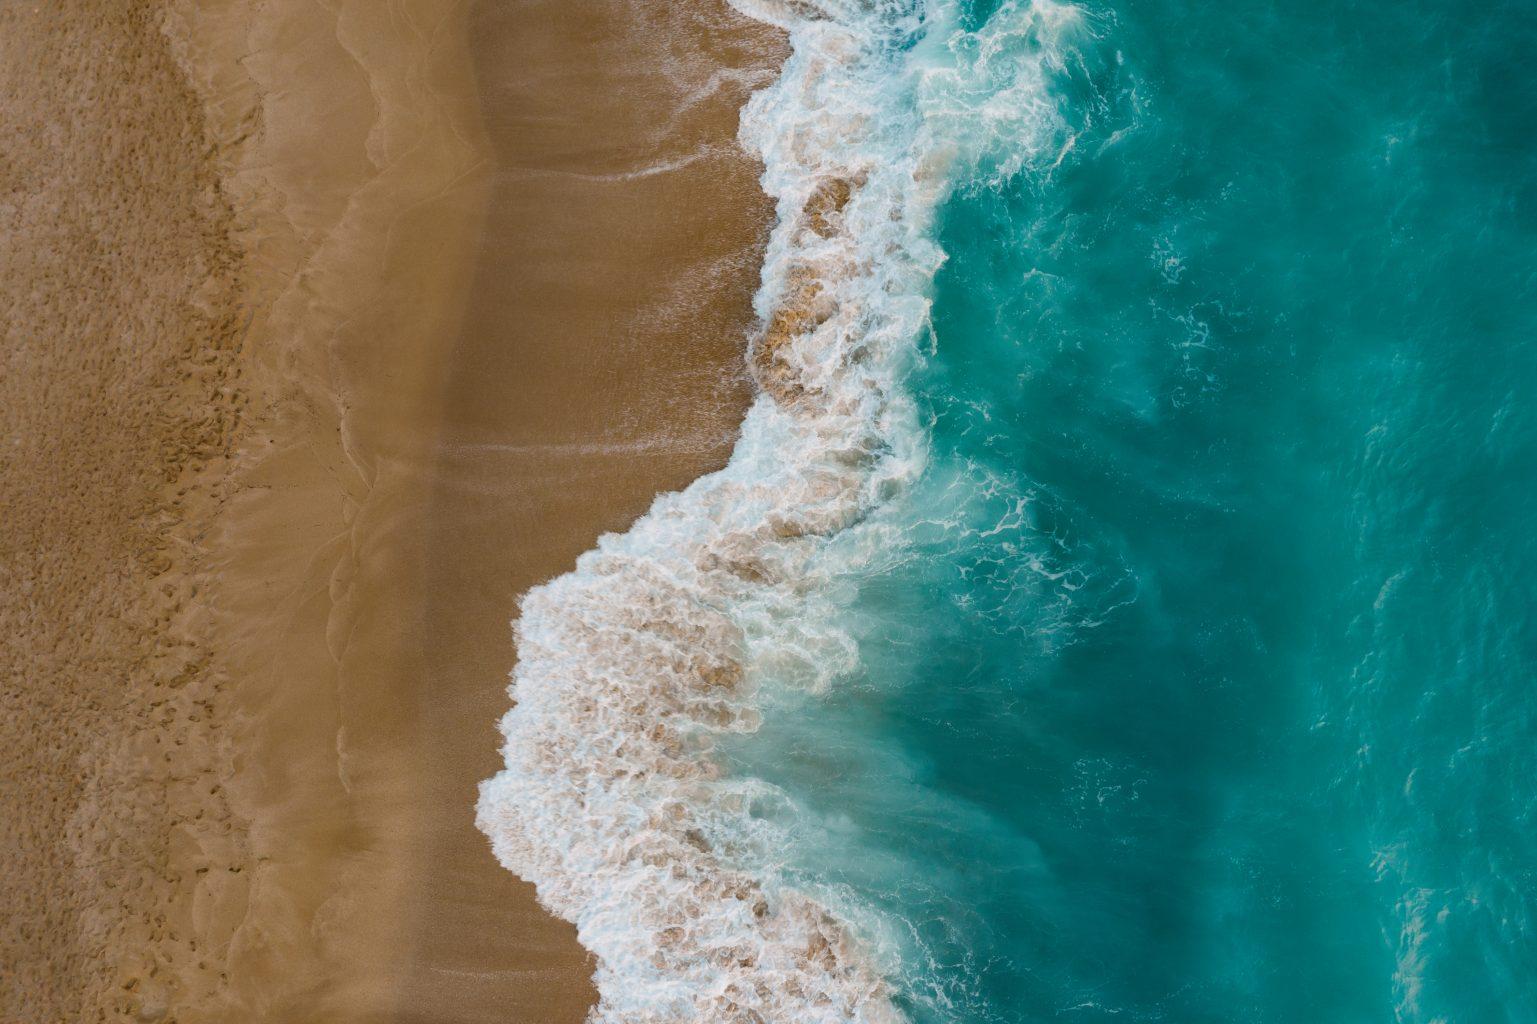 Blue sea wave on sandy beach. Sea shore top view